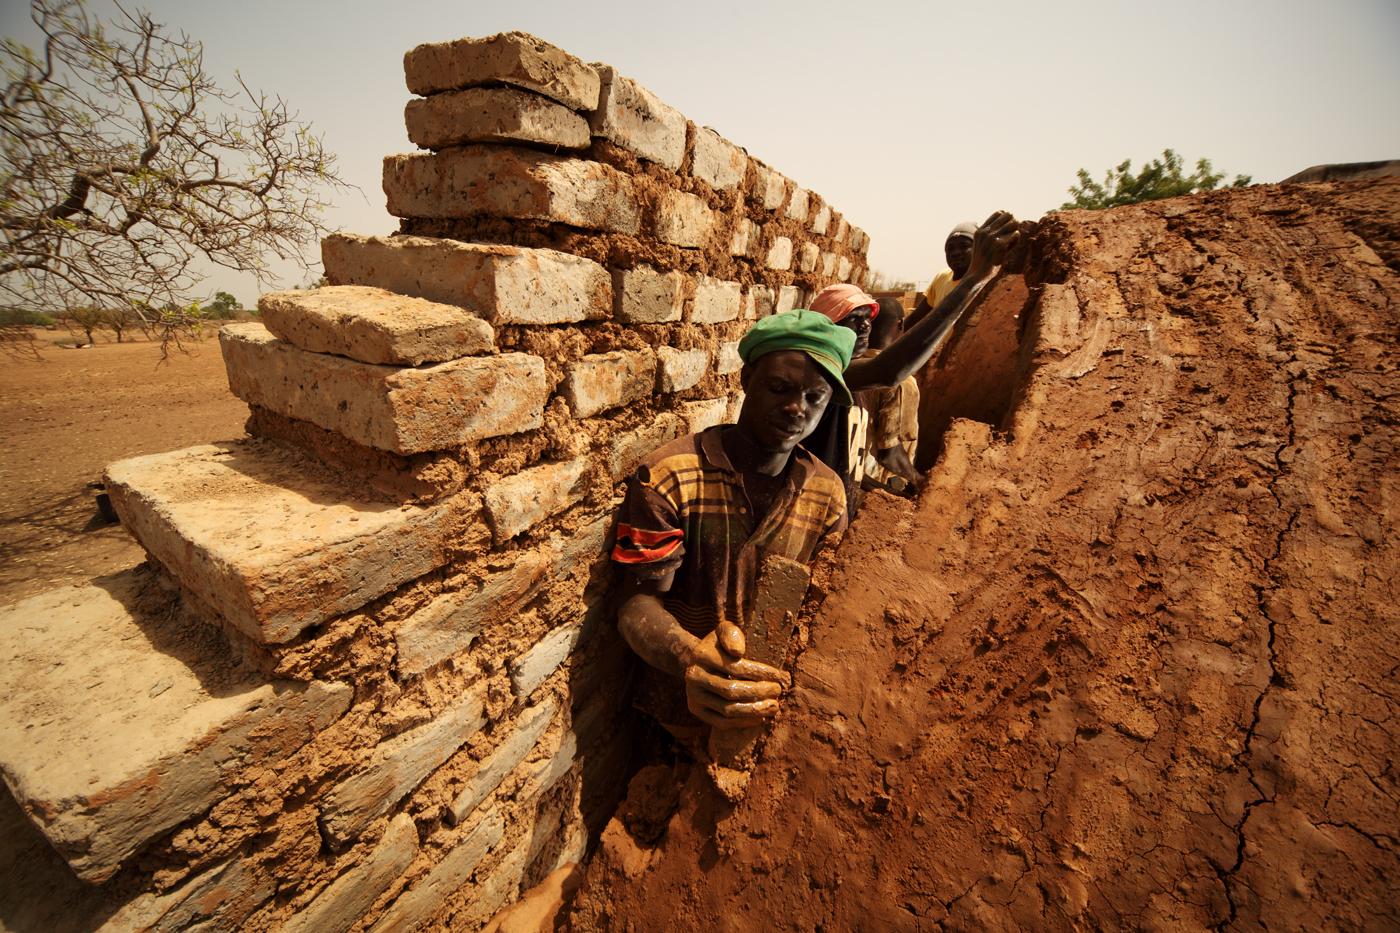 Laying_bricks_-_Earth_Roofs_in_the_Sahel_Program.jpg